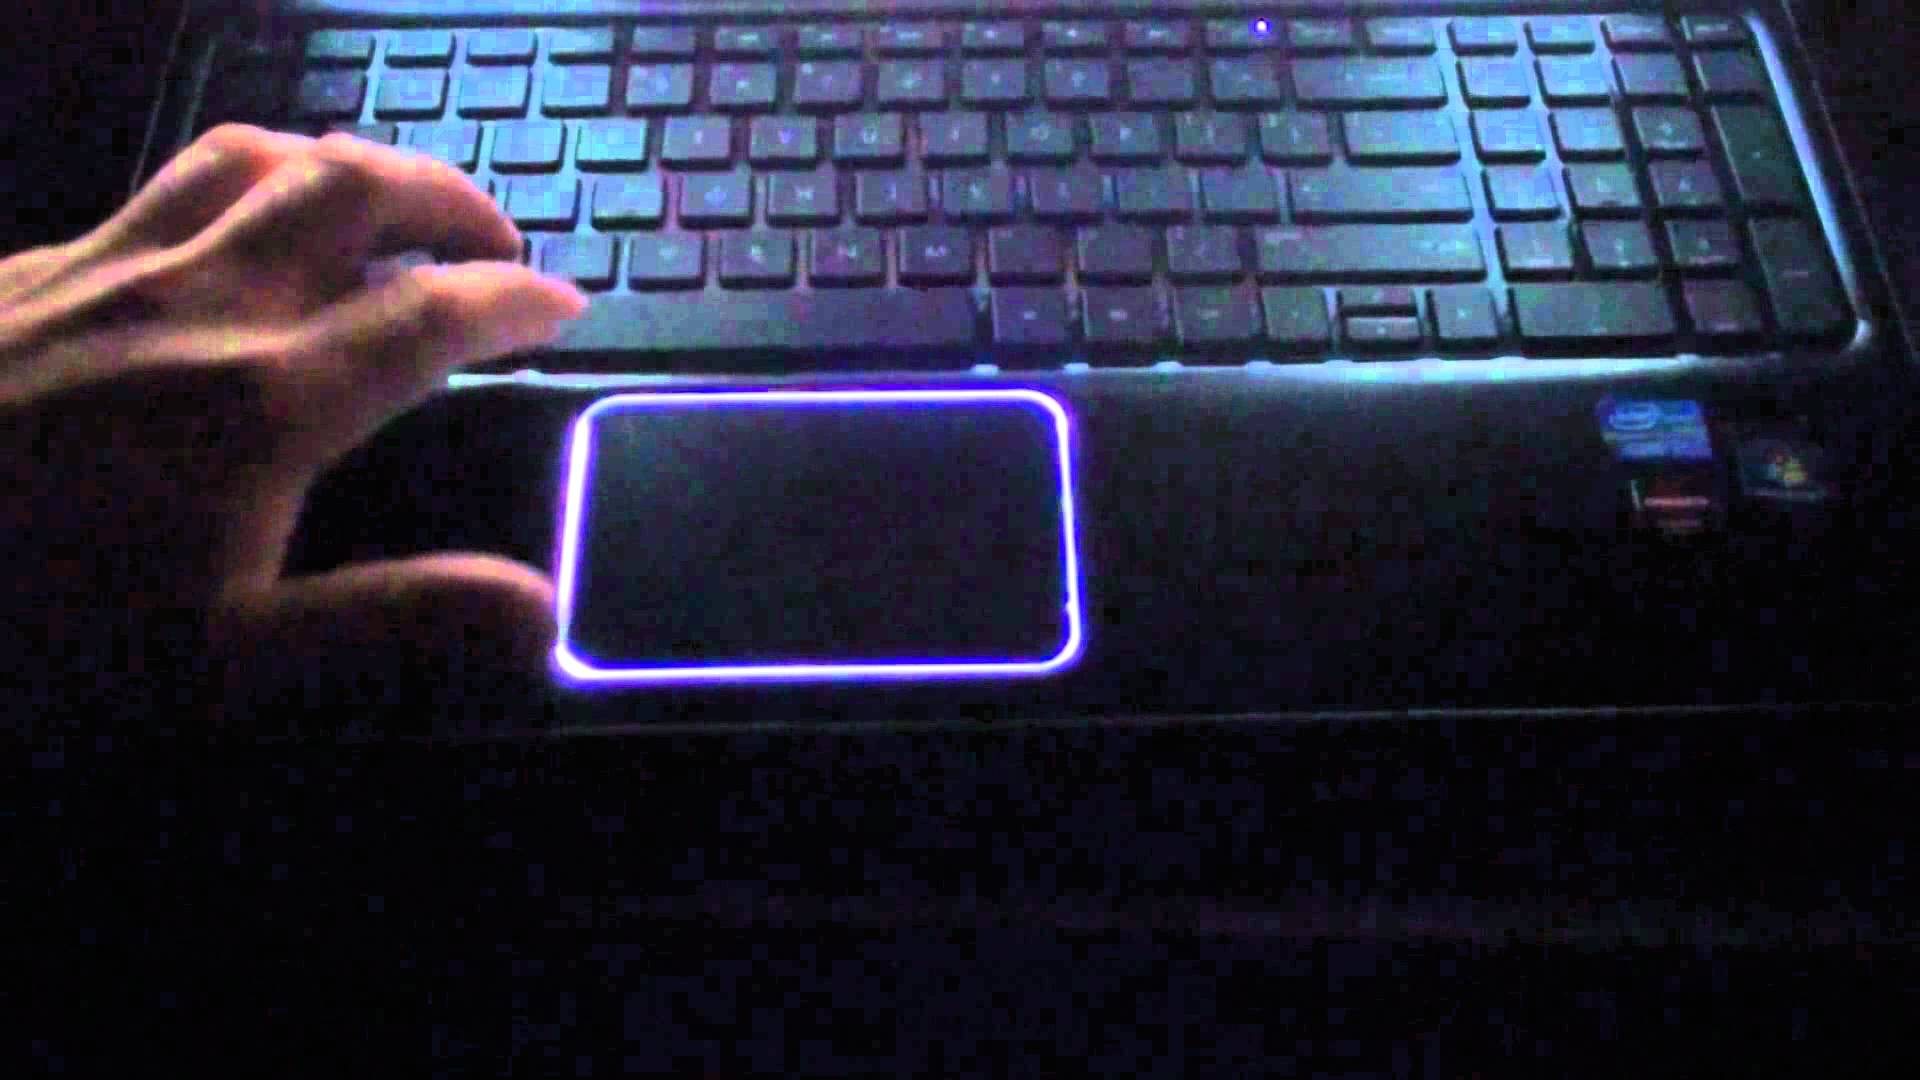 turn off keyboard on hp laptop